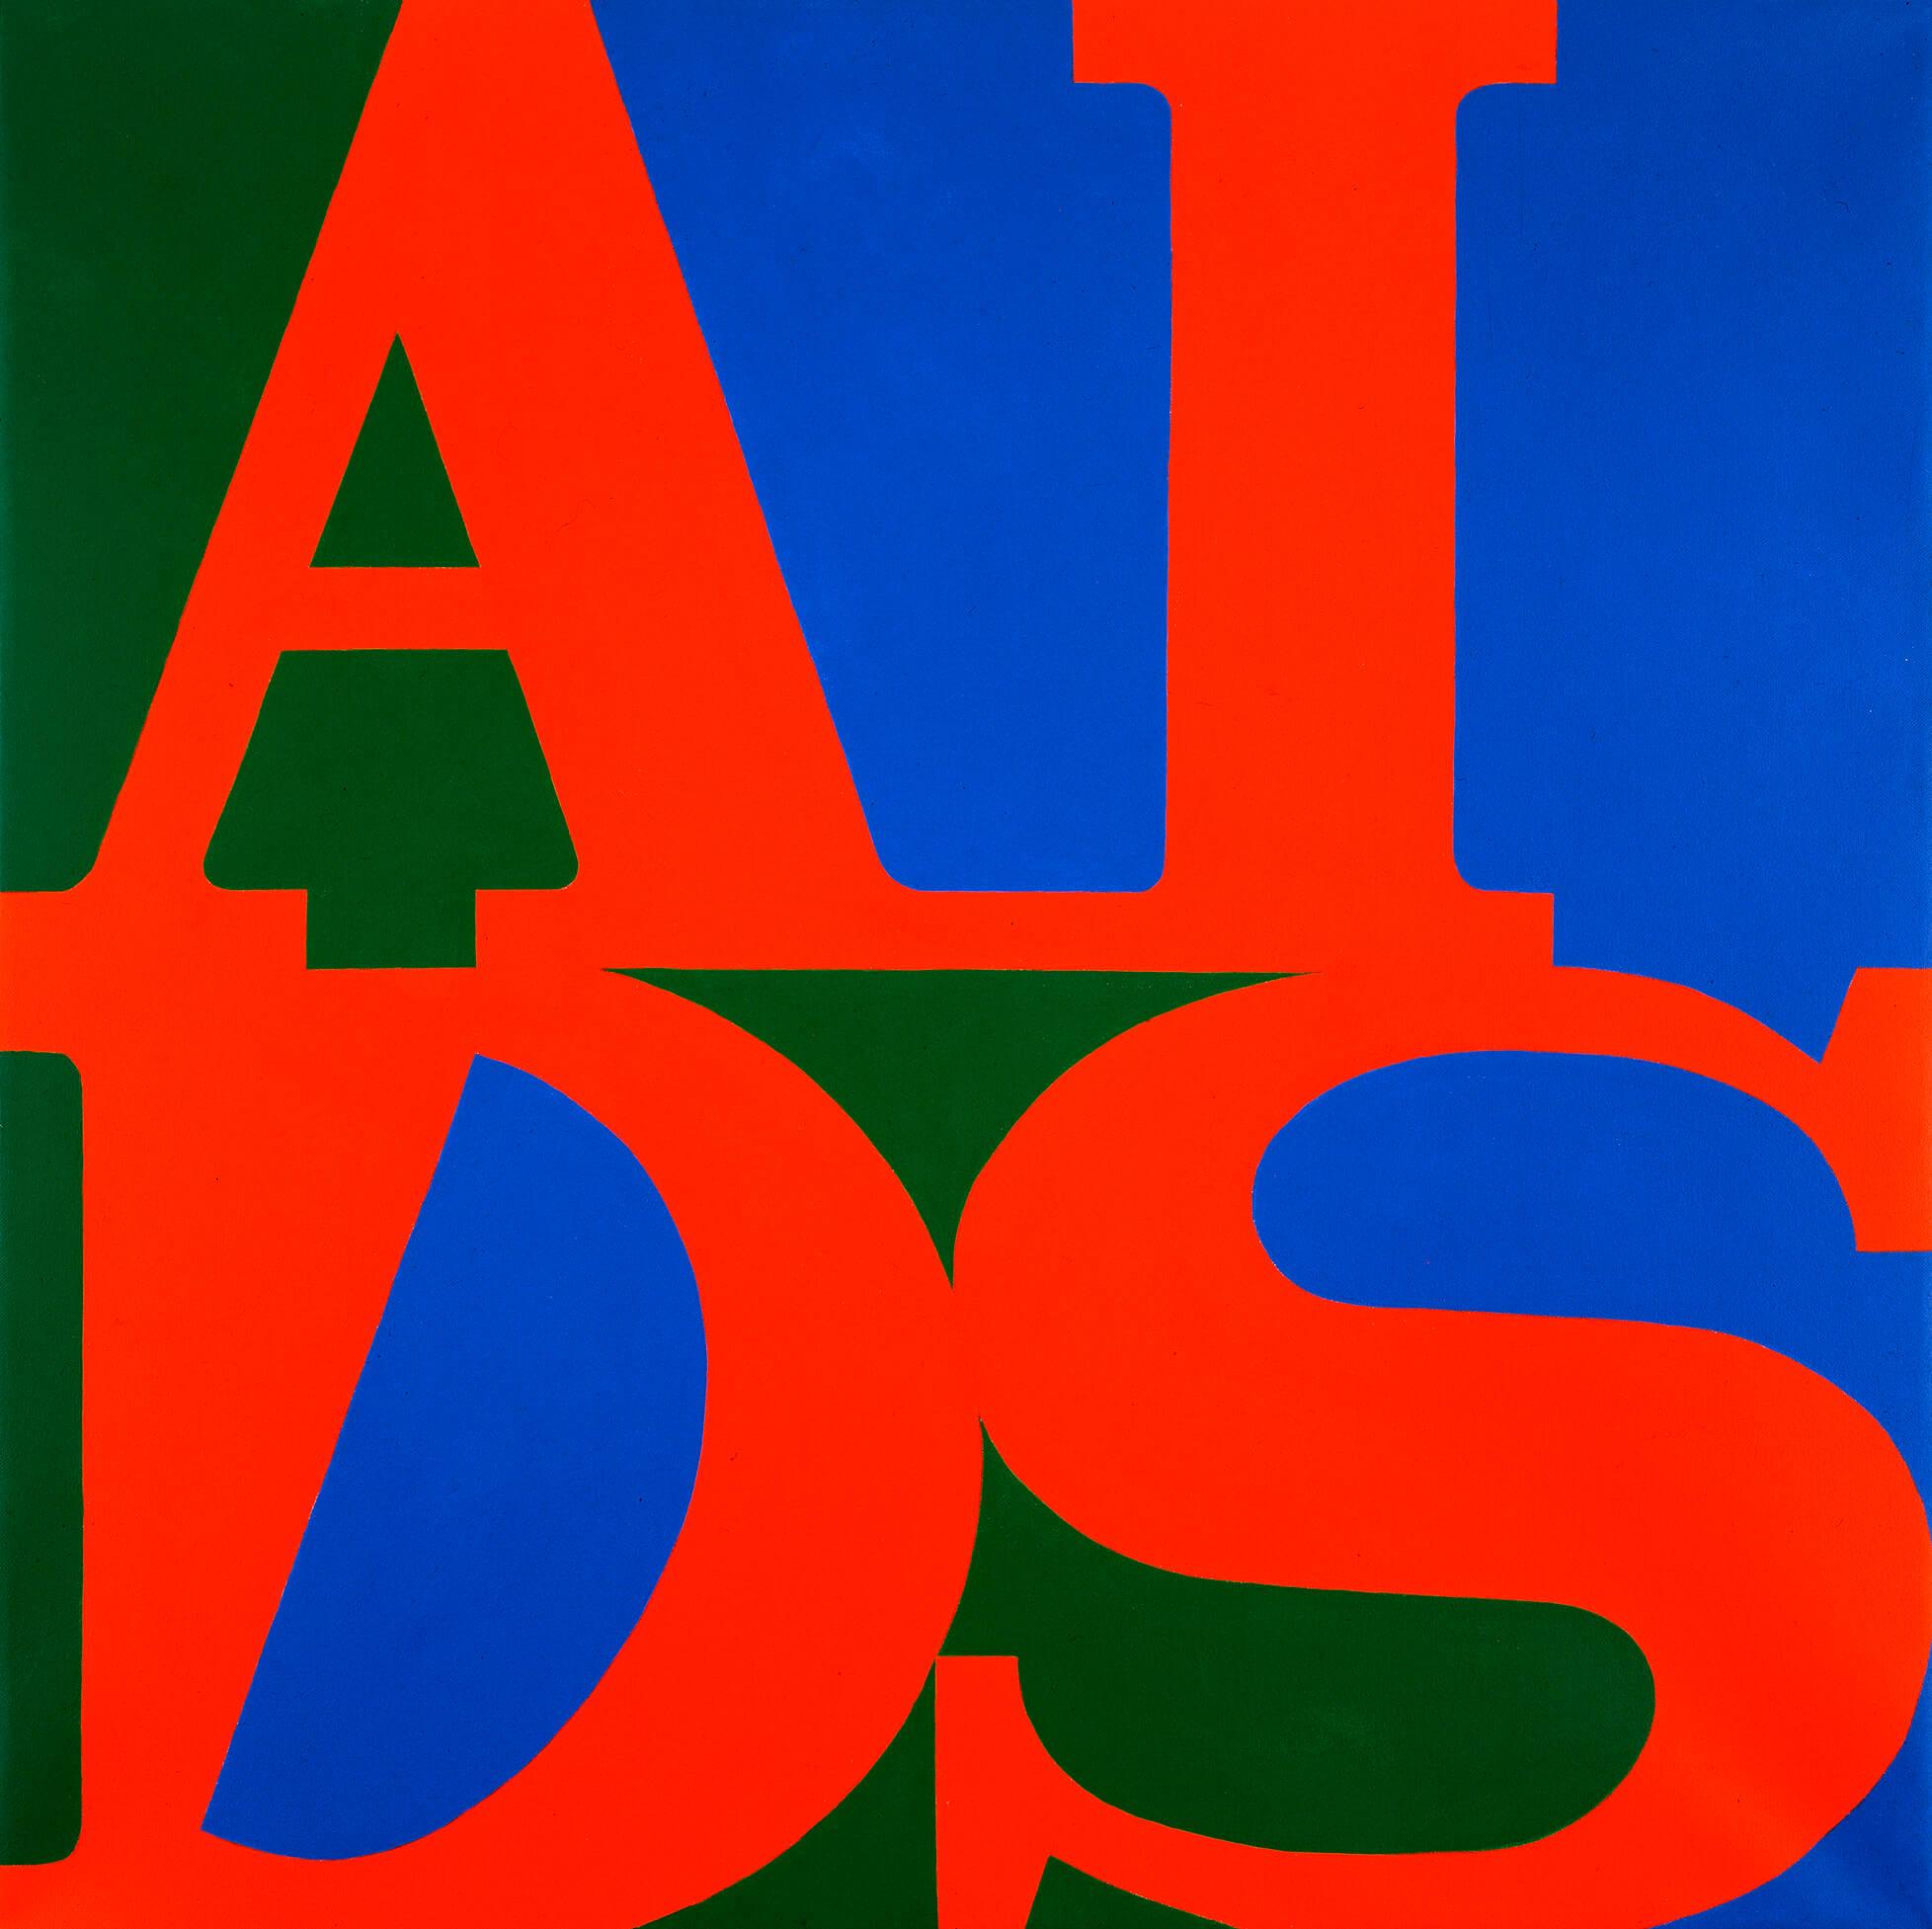 General Idea, SIDA, 1987